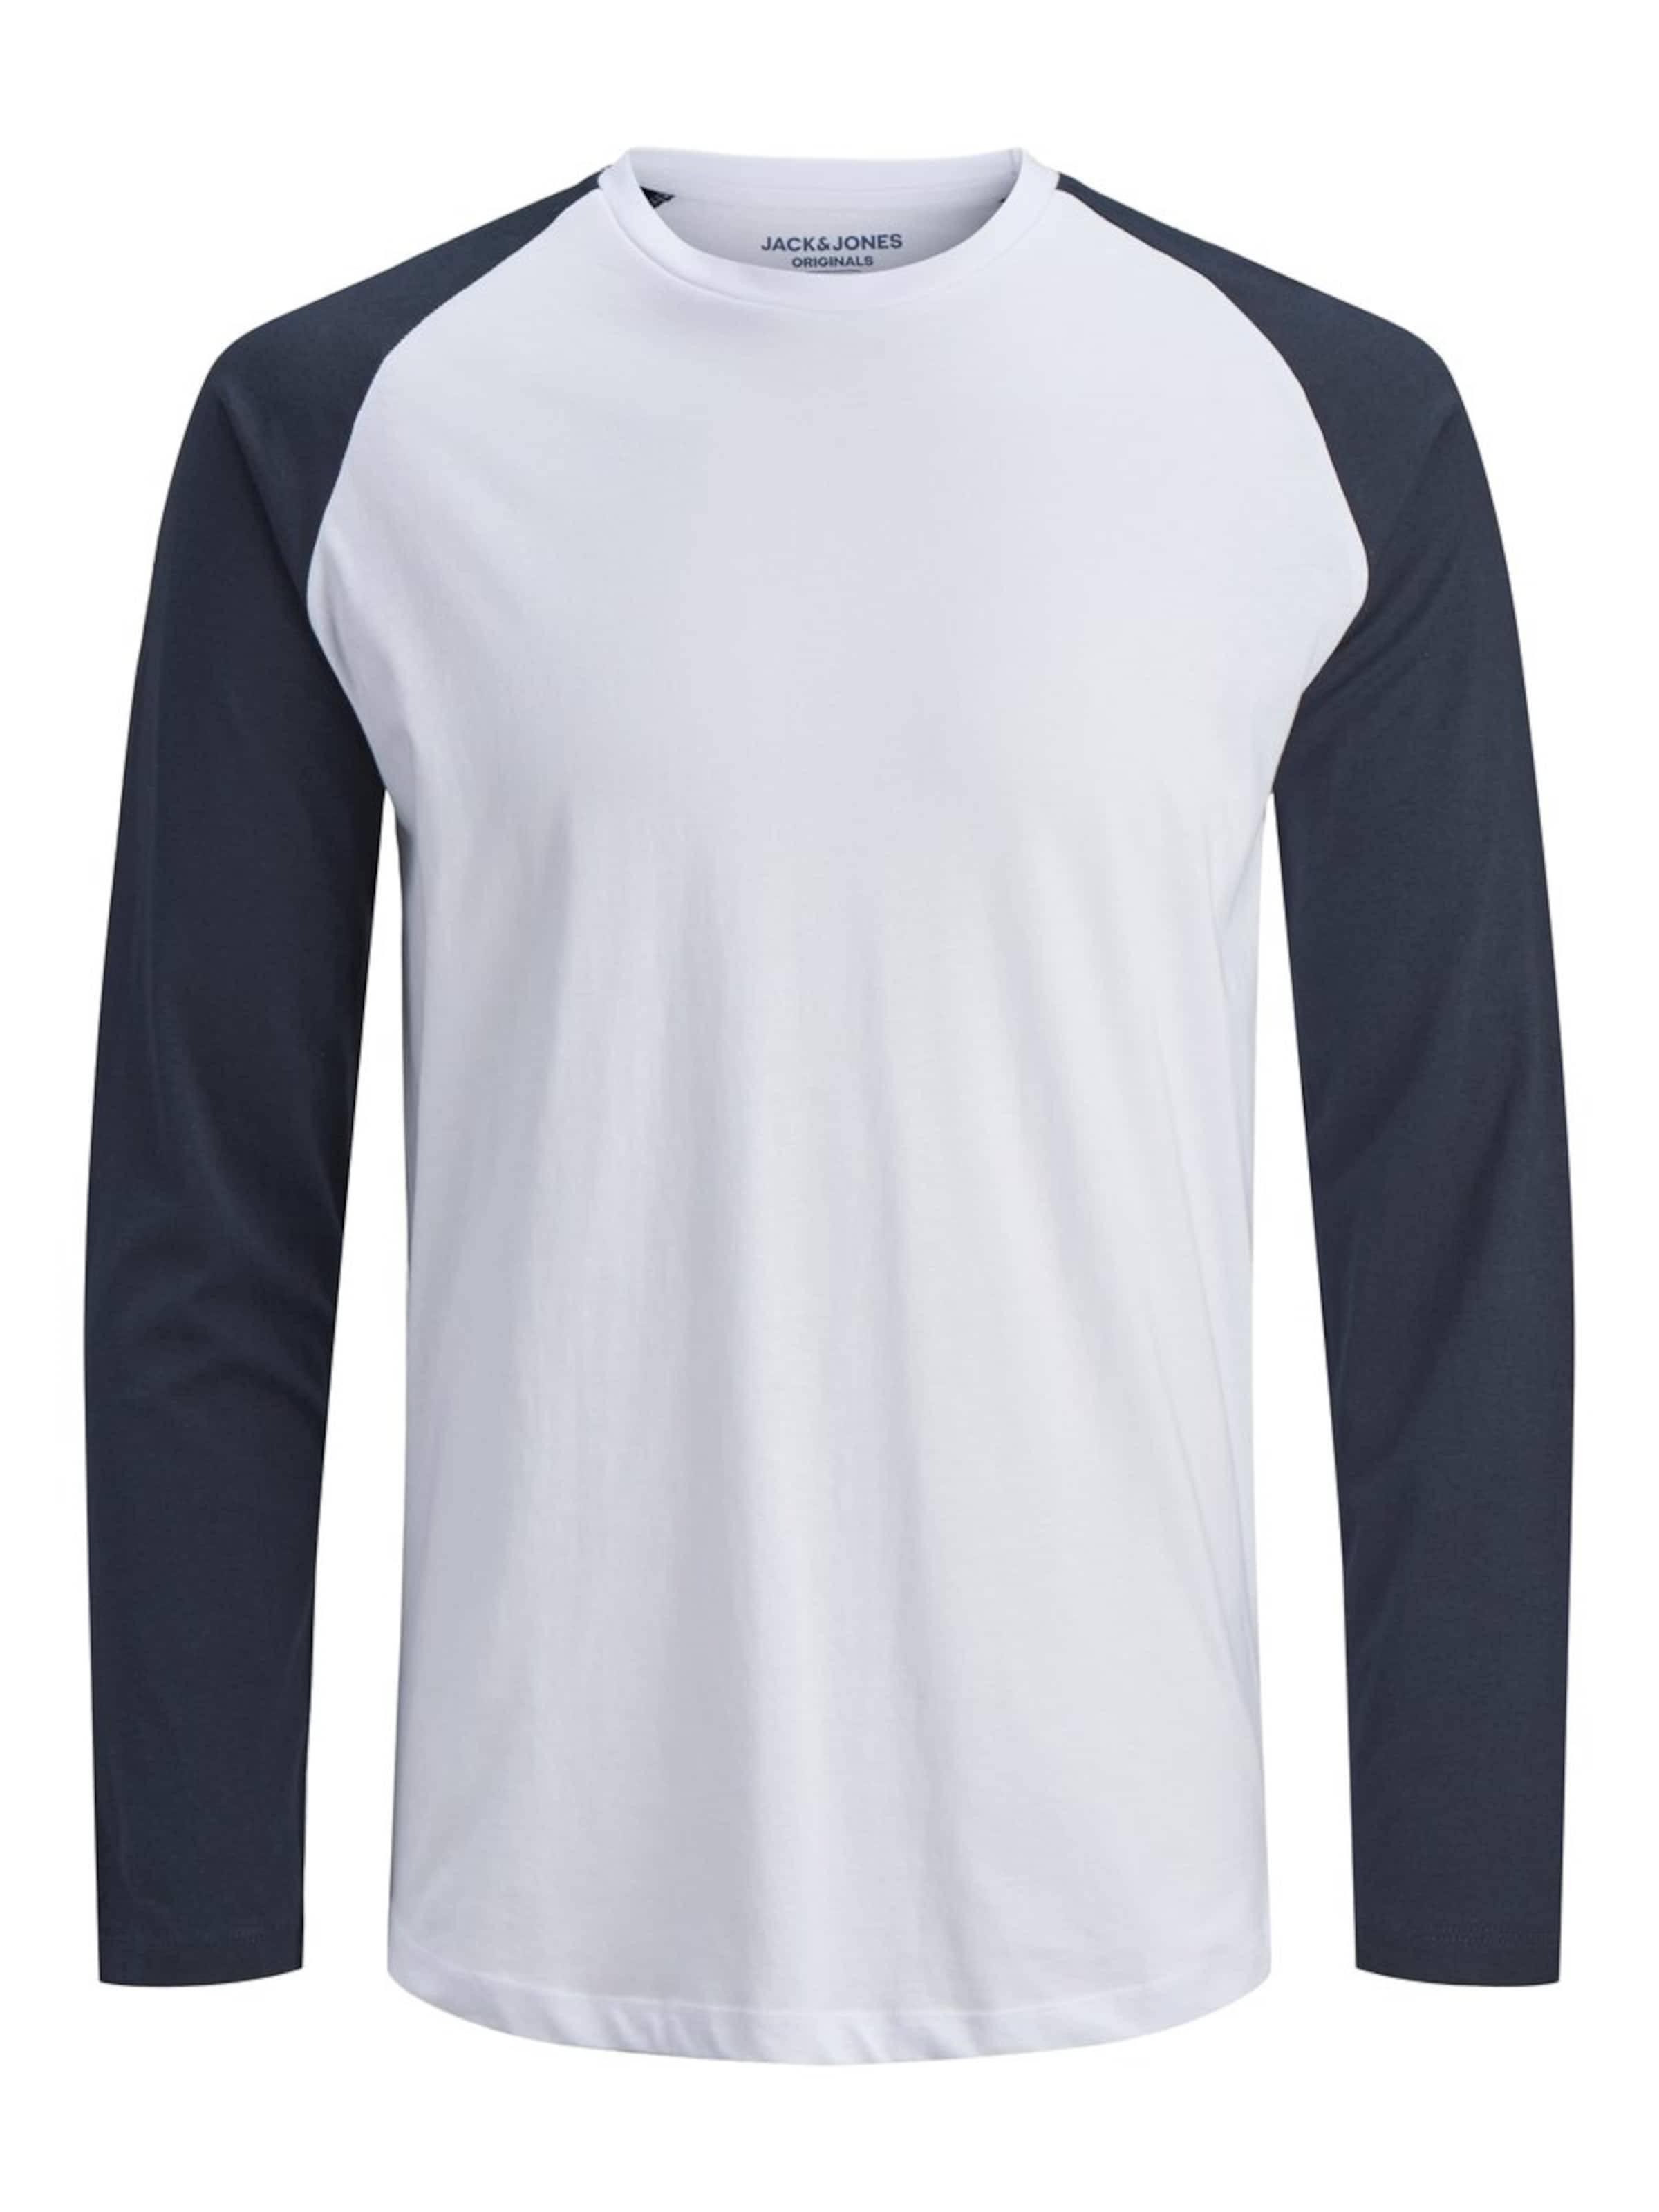 NoirBlanc Jackamp; En T Jones shirt lF1cJ3TK